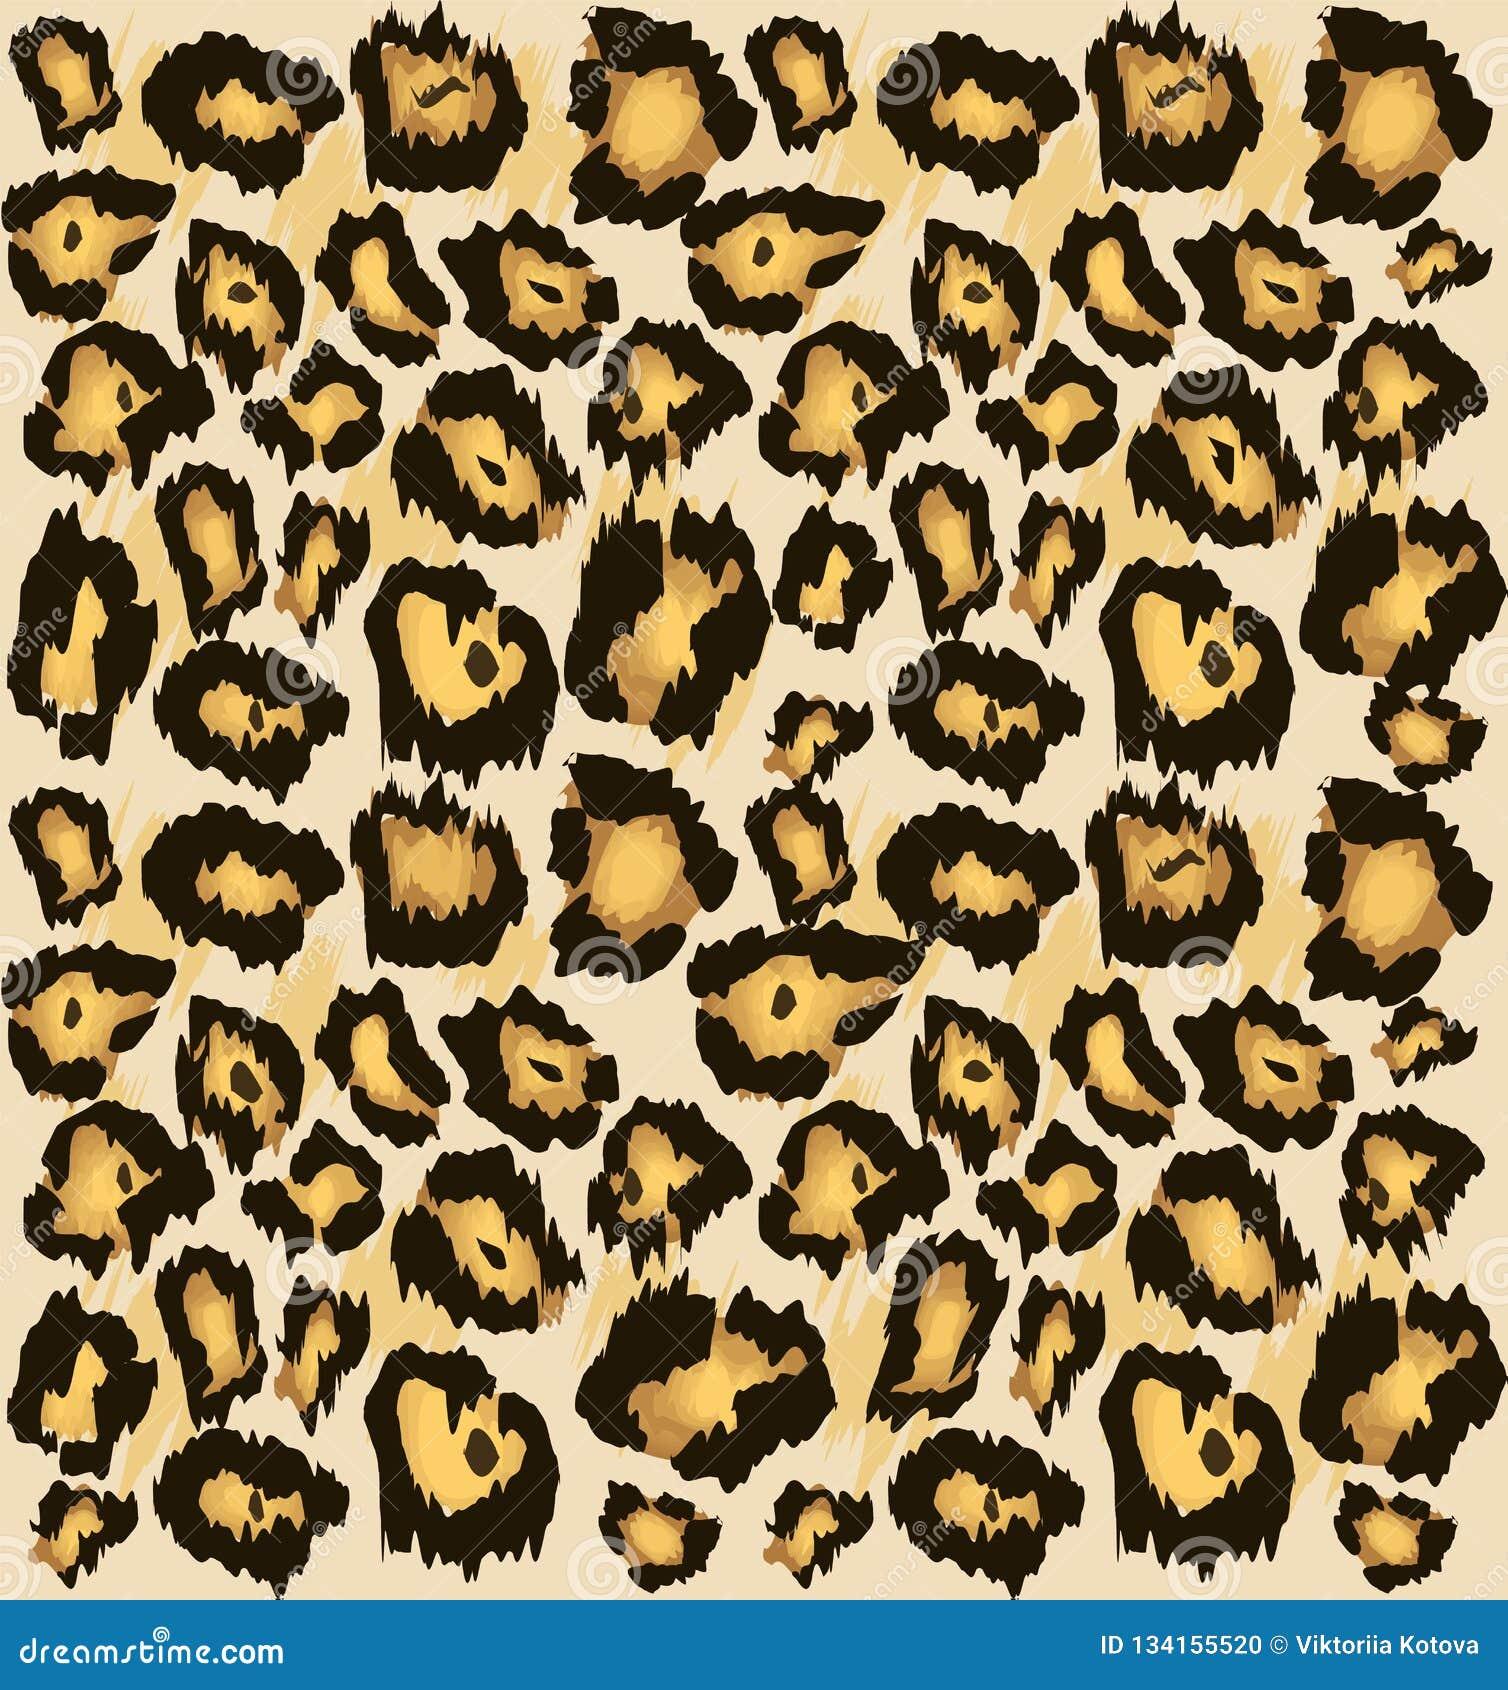 Leopard Cheetah Skin Seamless Pattern,   Stylized Spotted